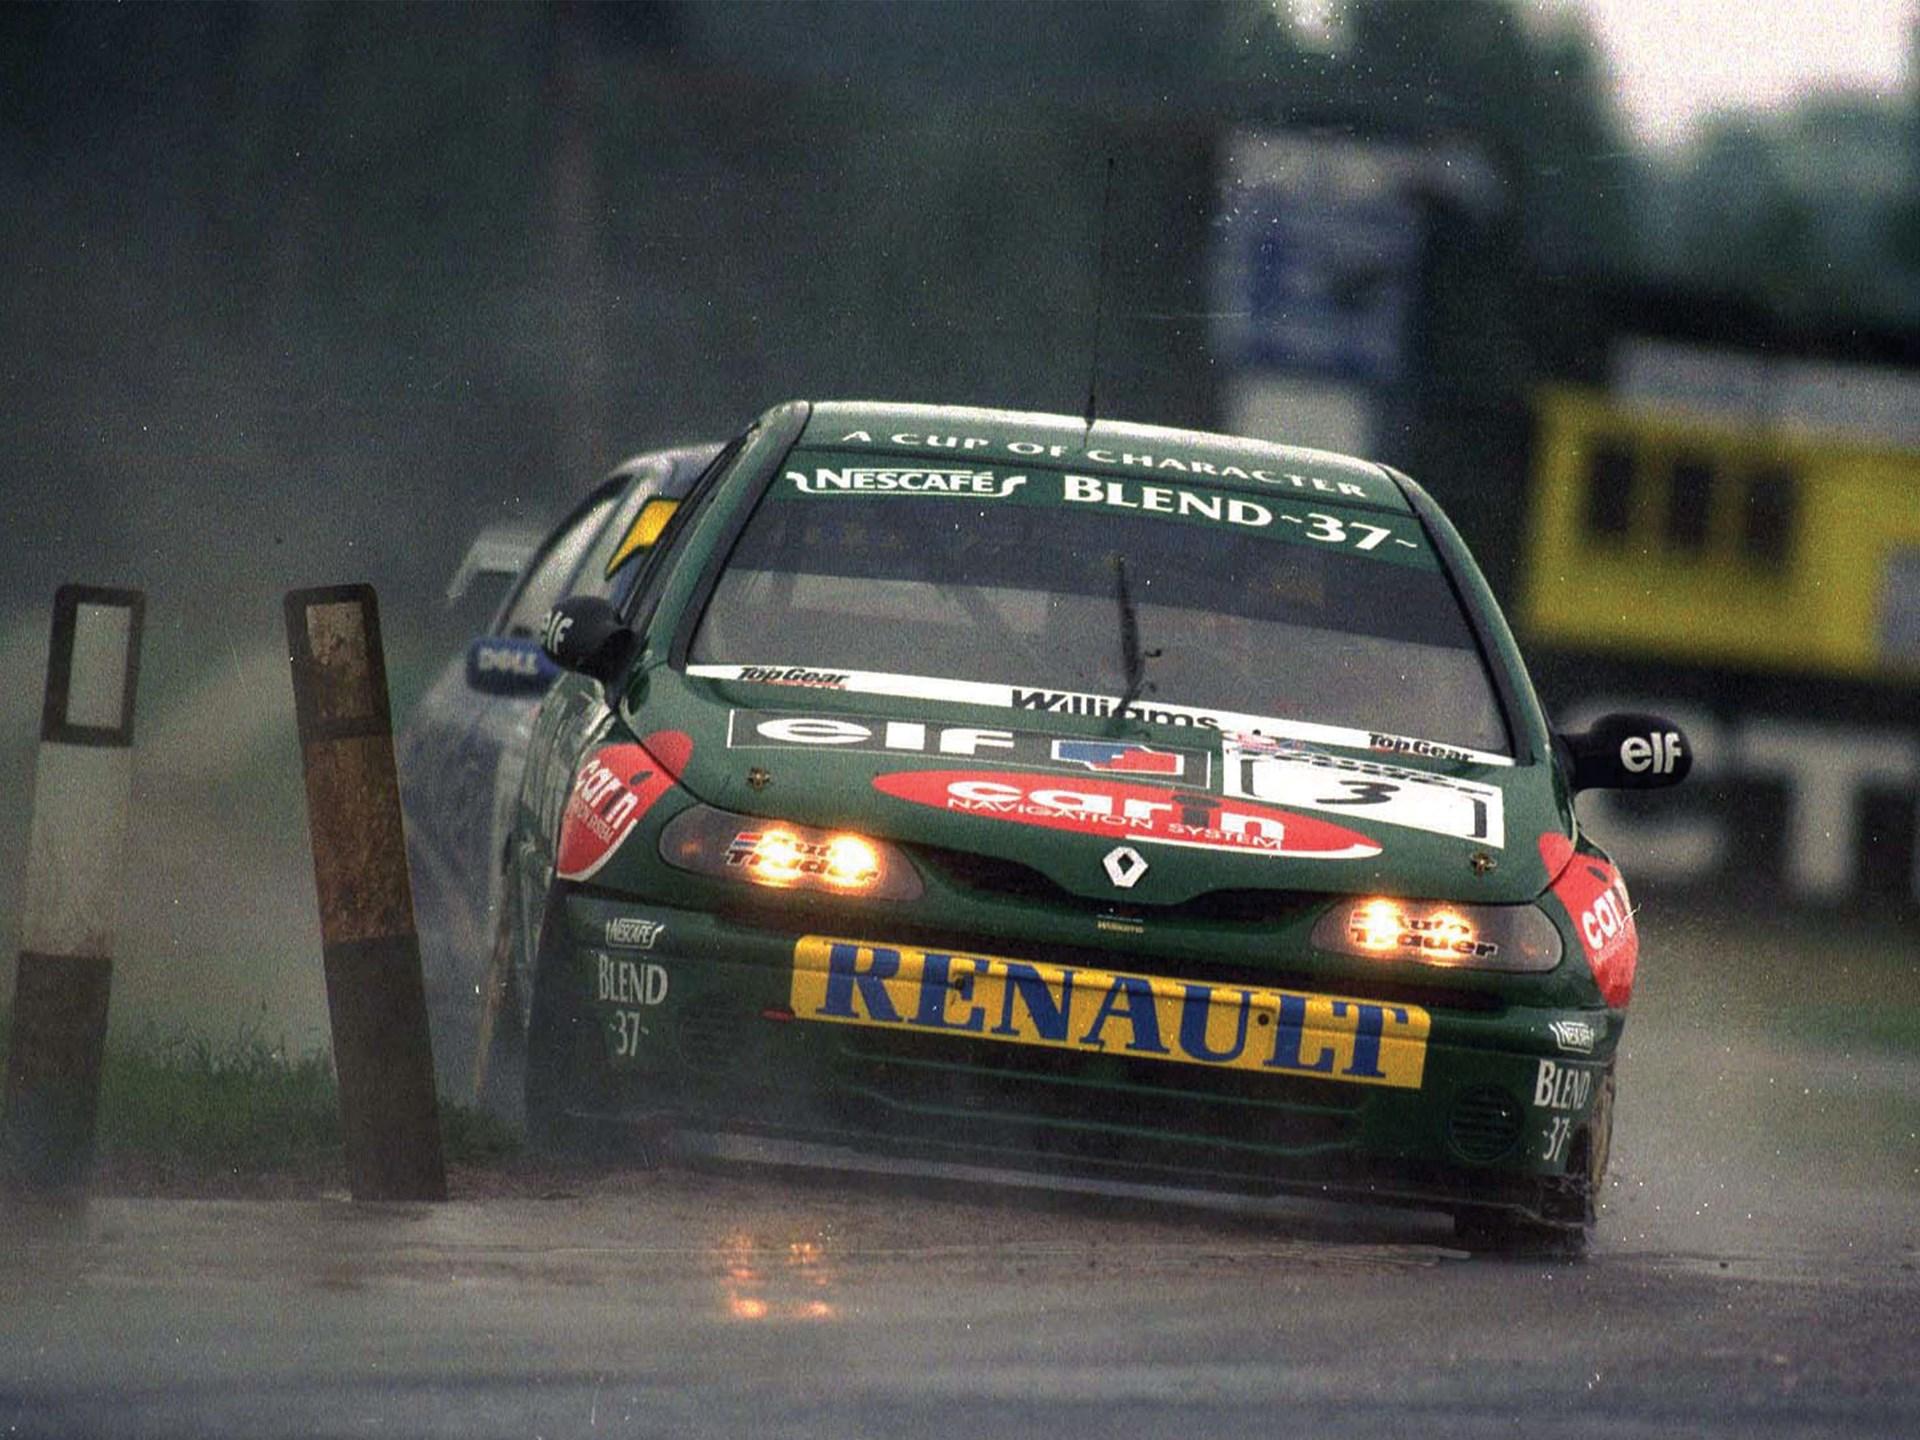 Jason Plato at speed during the 1998 British Touring Car Championship.